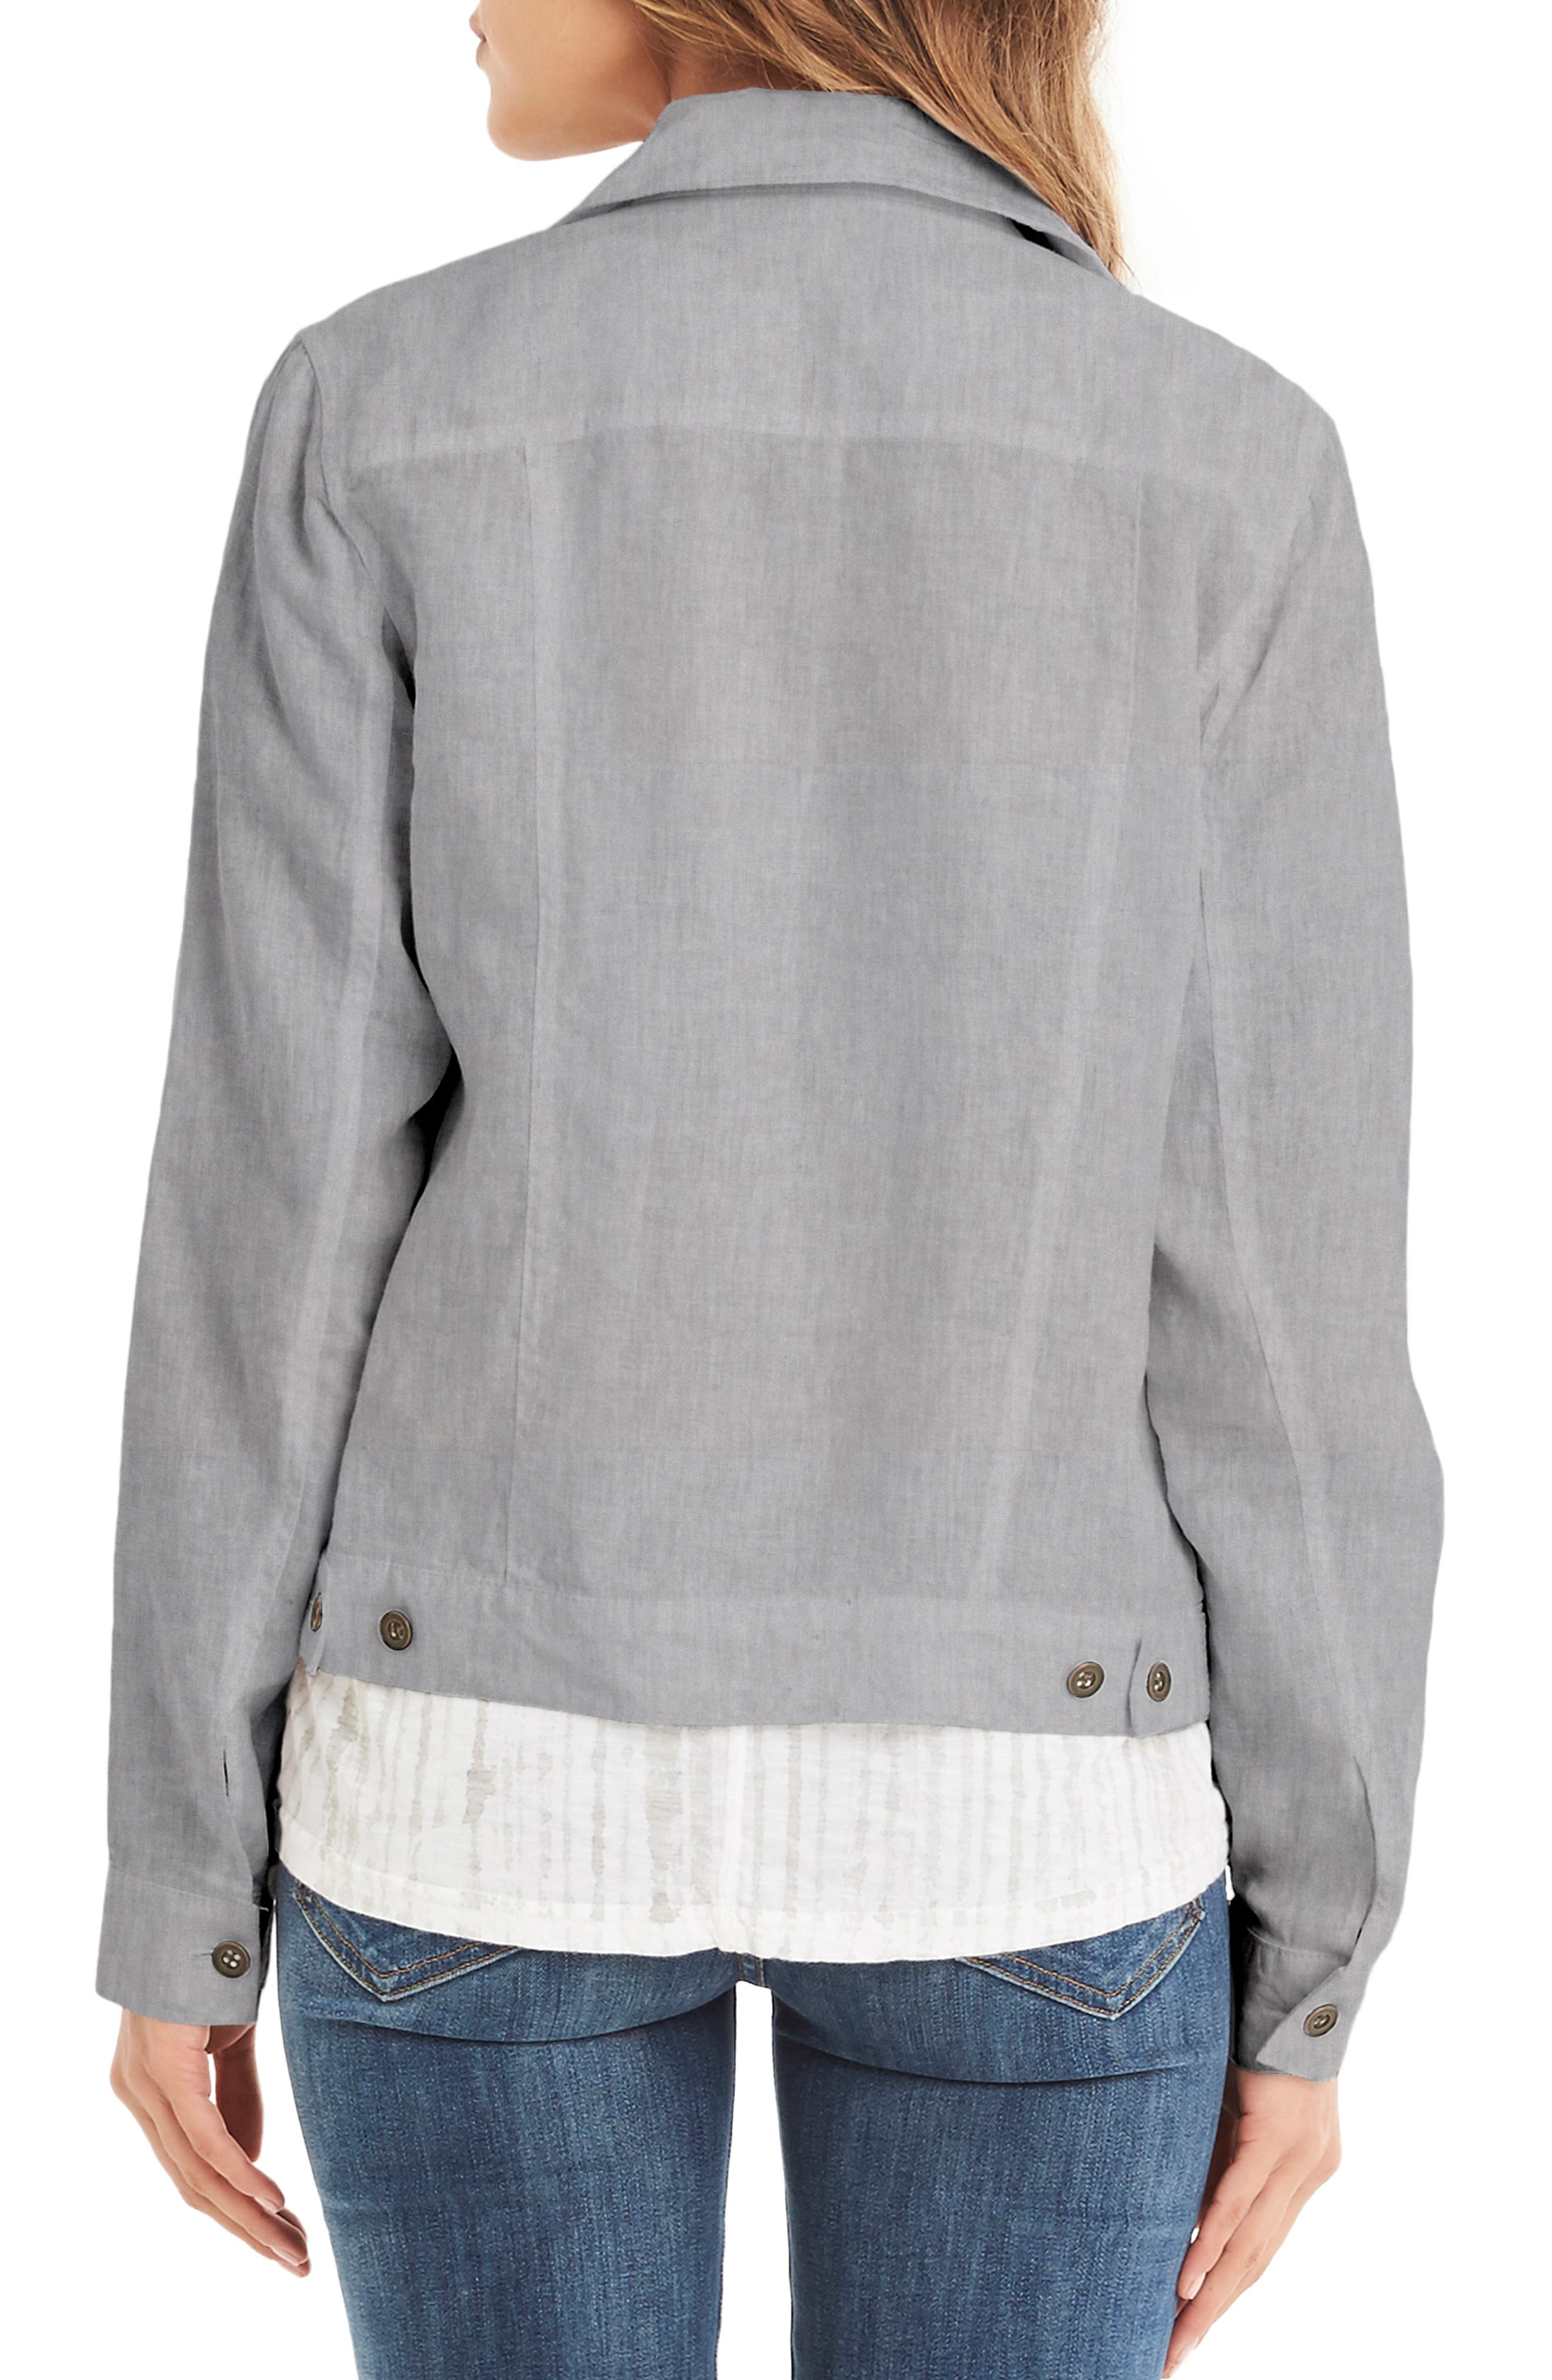 Linen Denim Jacket,                             Alternate thumbnail 2, color,                             050